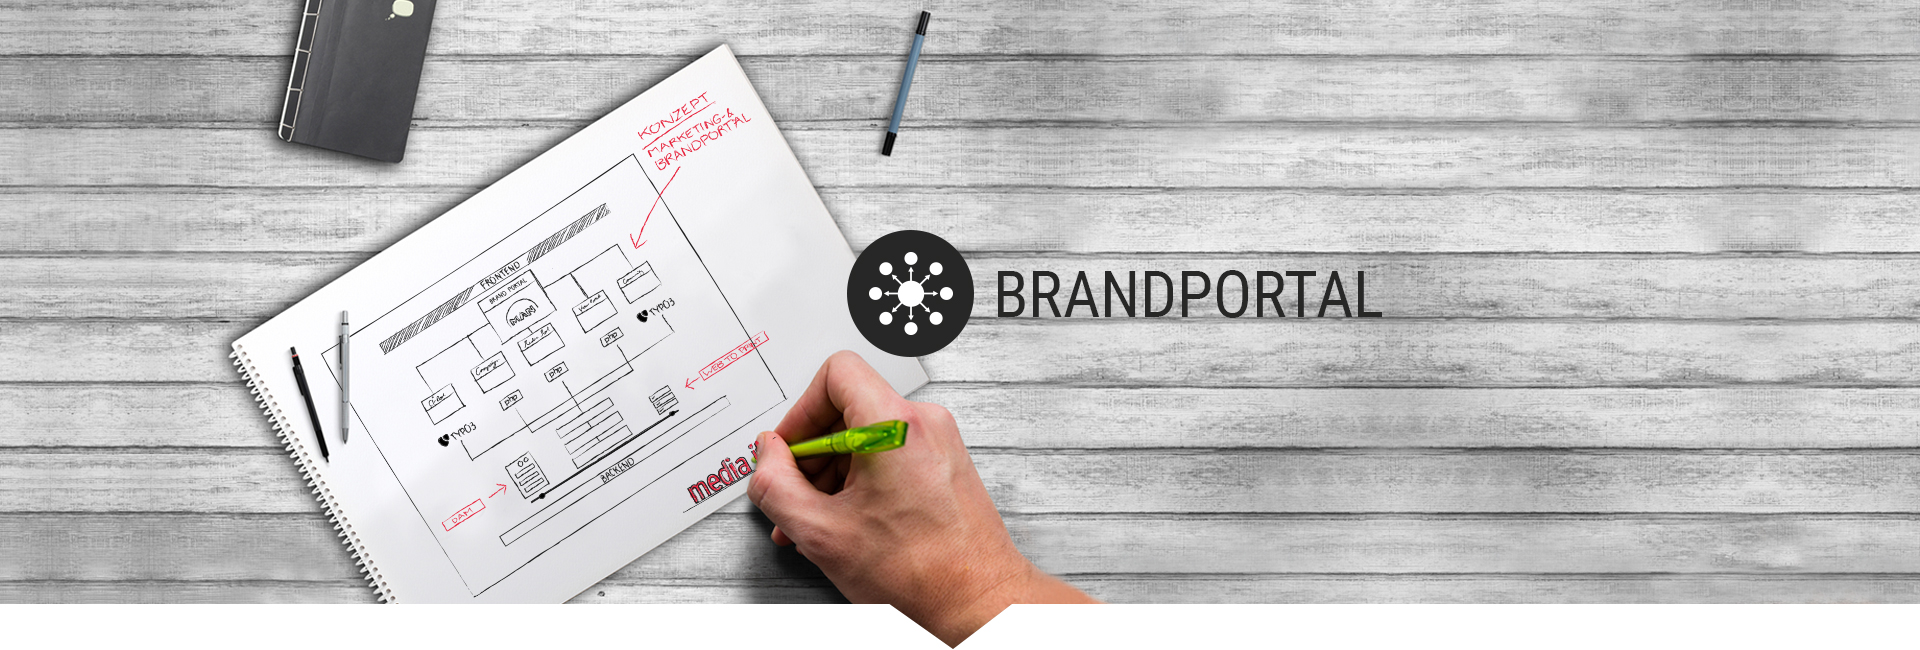 Brand Portal